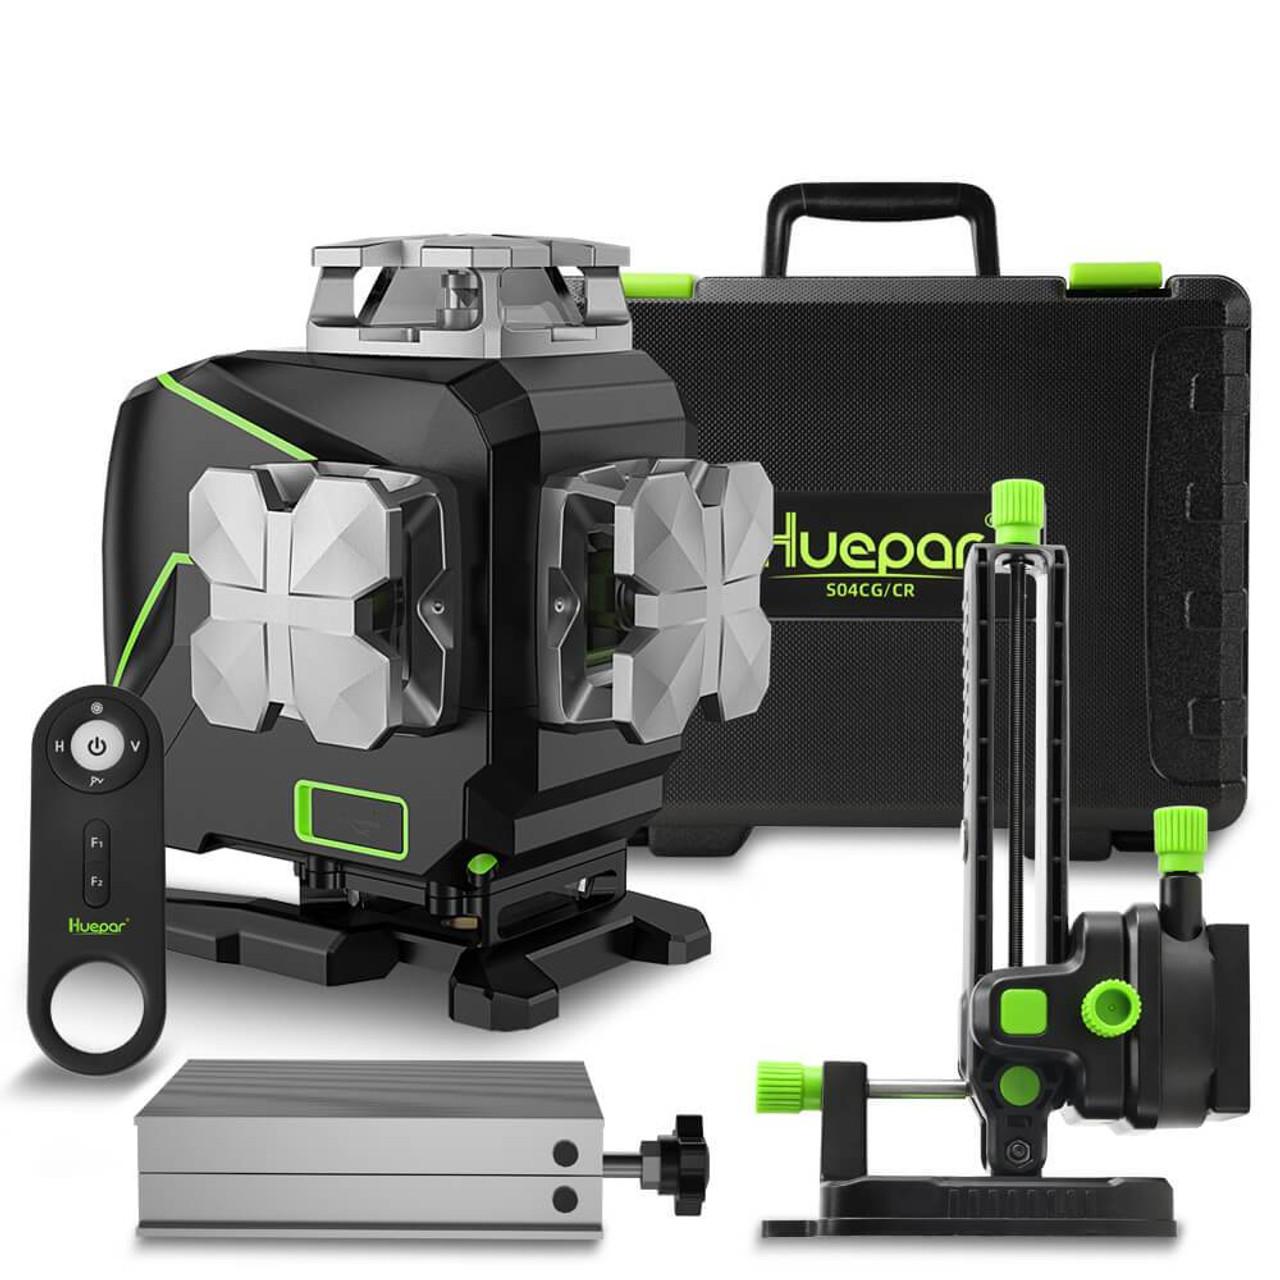 Huepar S04CG 4D Green Cross Line Laser Level